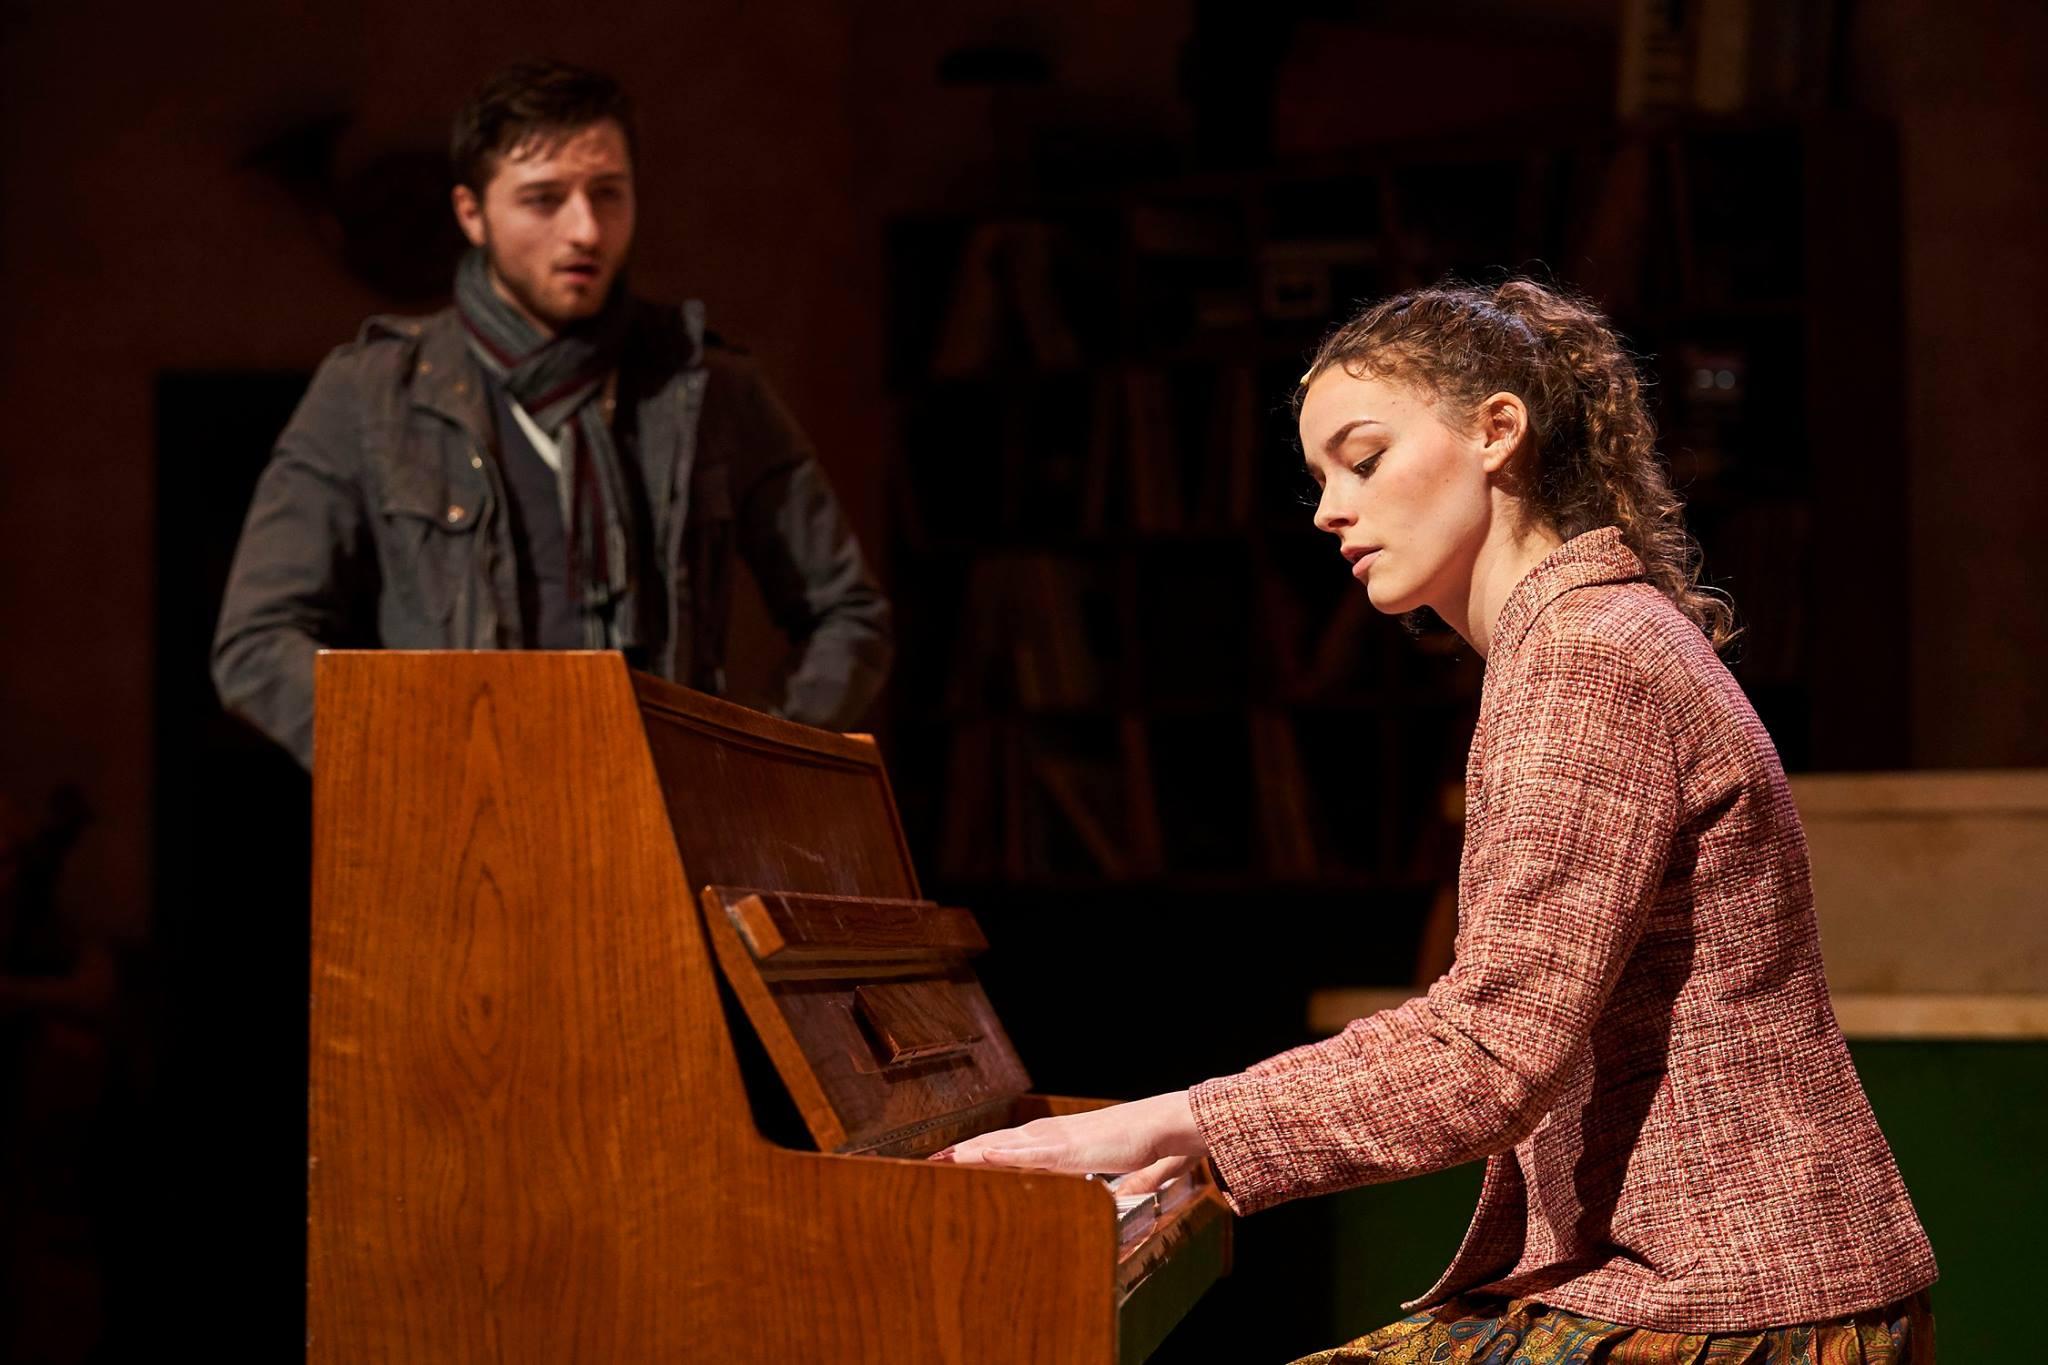 Julie Gilliland - Jake Slater (Guy) and Kelsey Brown (Girl) in Once. Photo Credit Roger Mastroianni.jpg